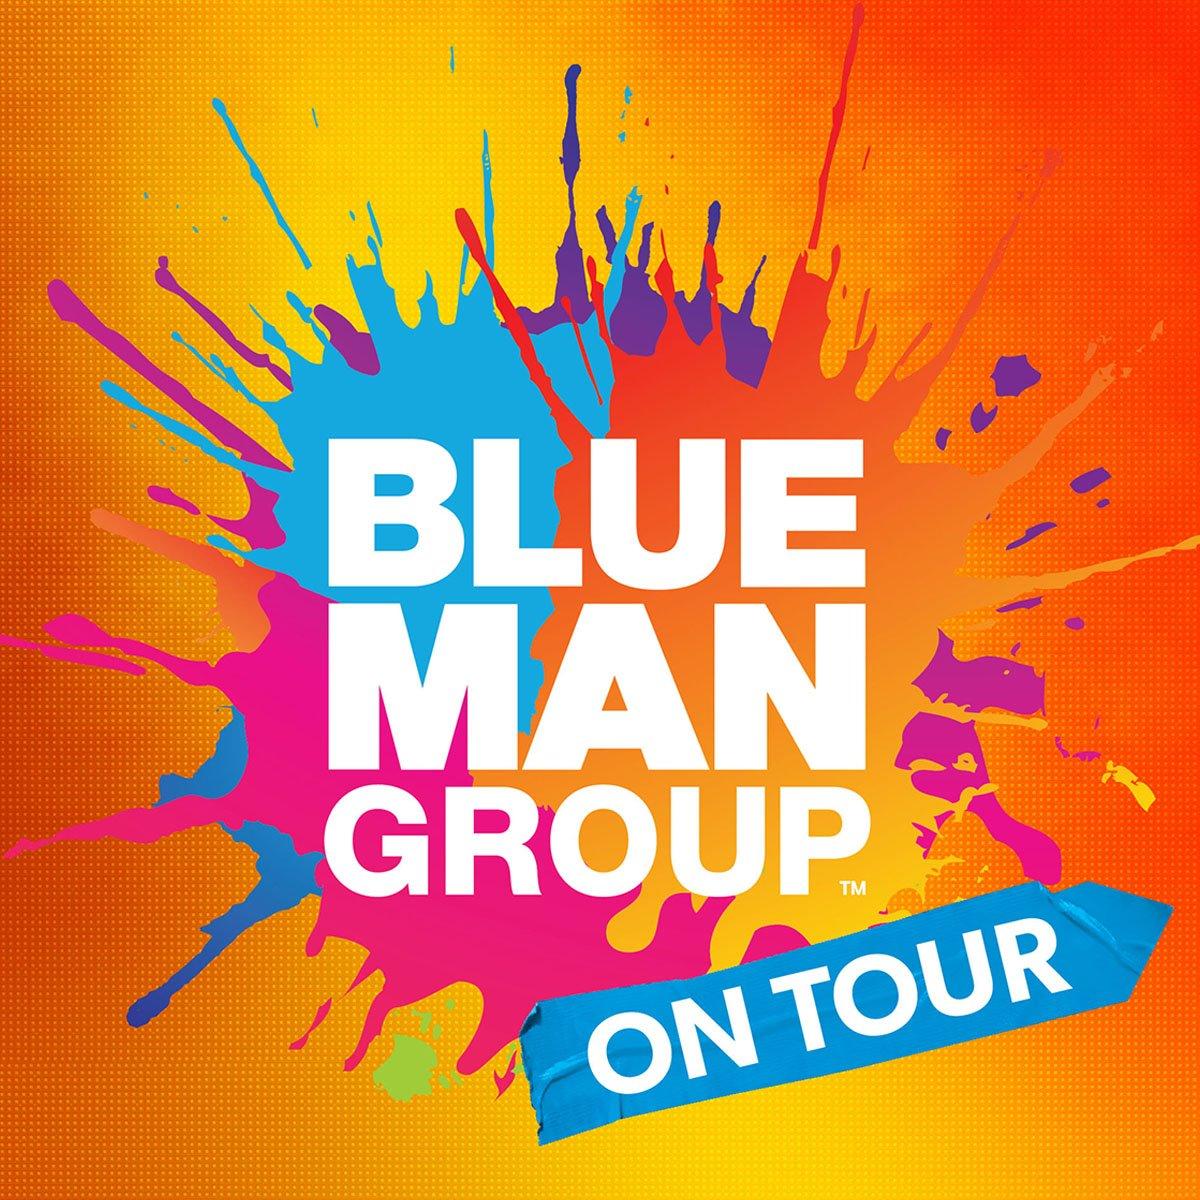 Blue Man Group Event Photo